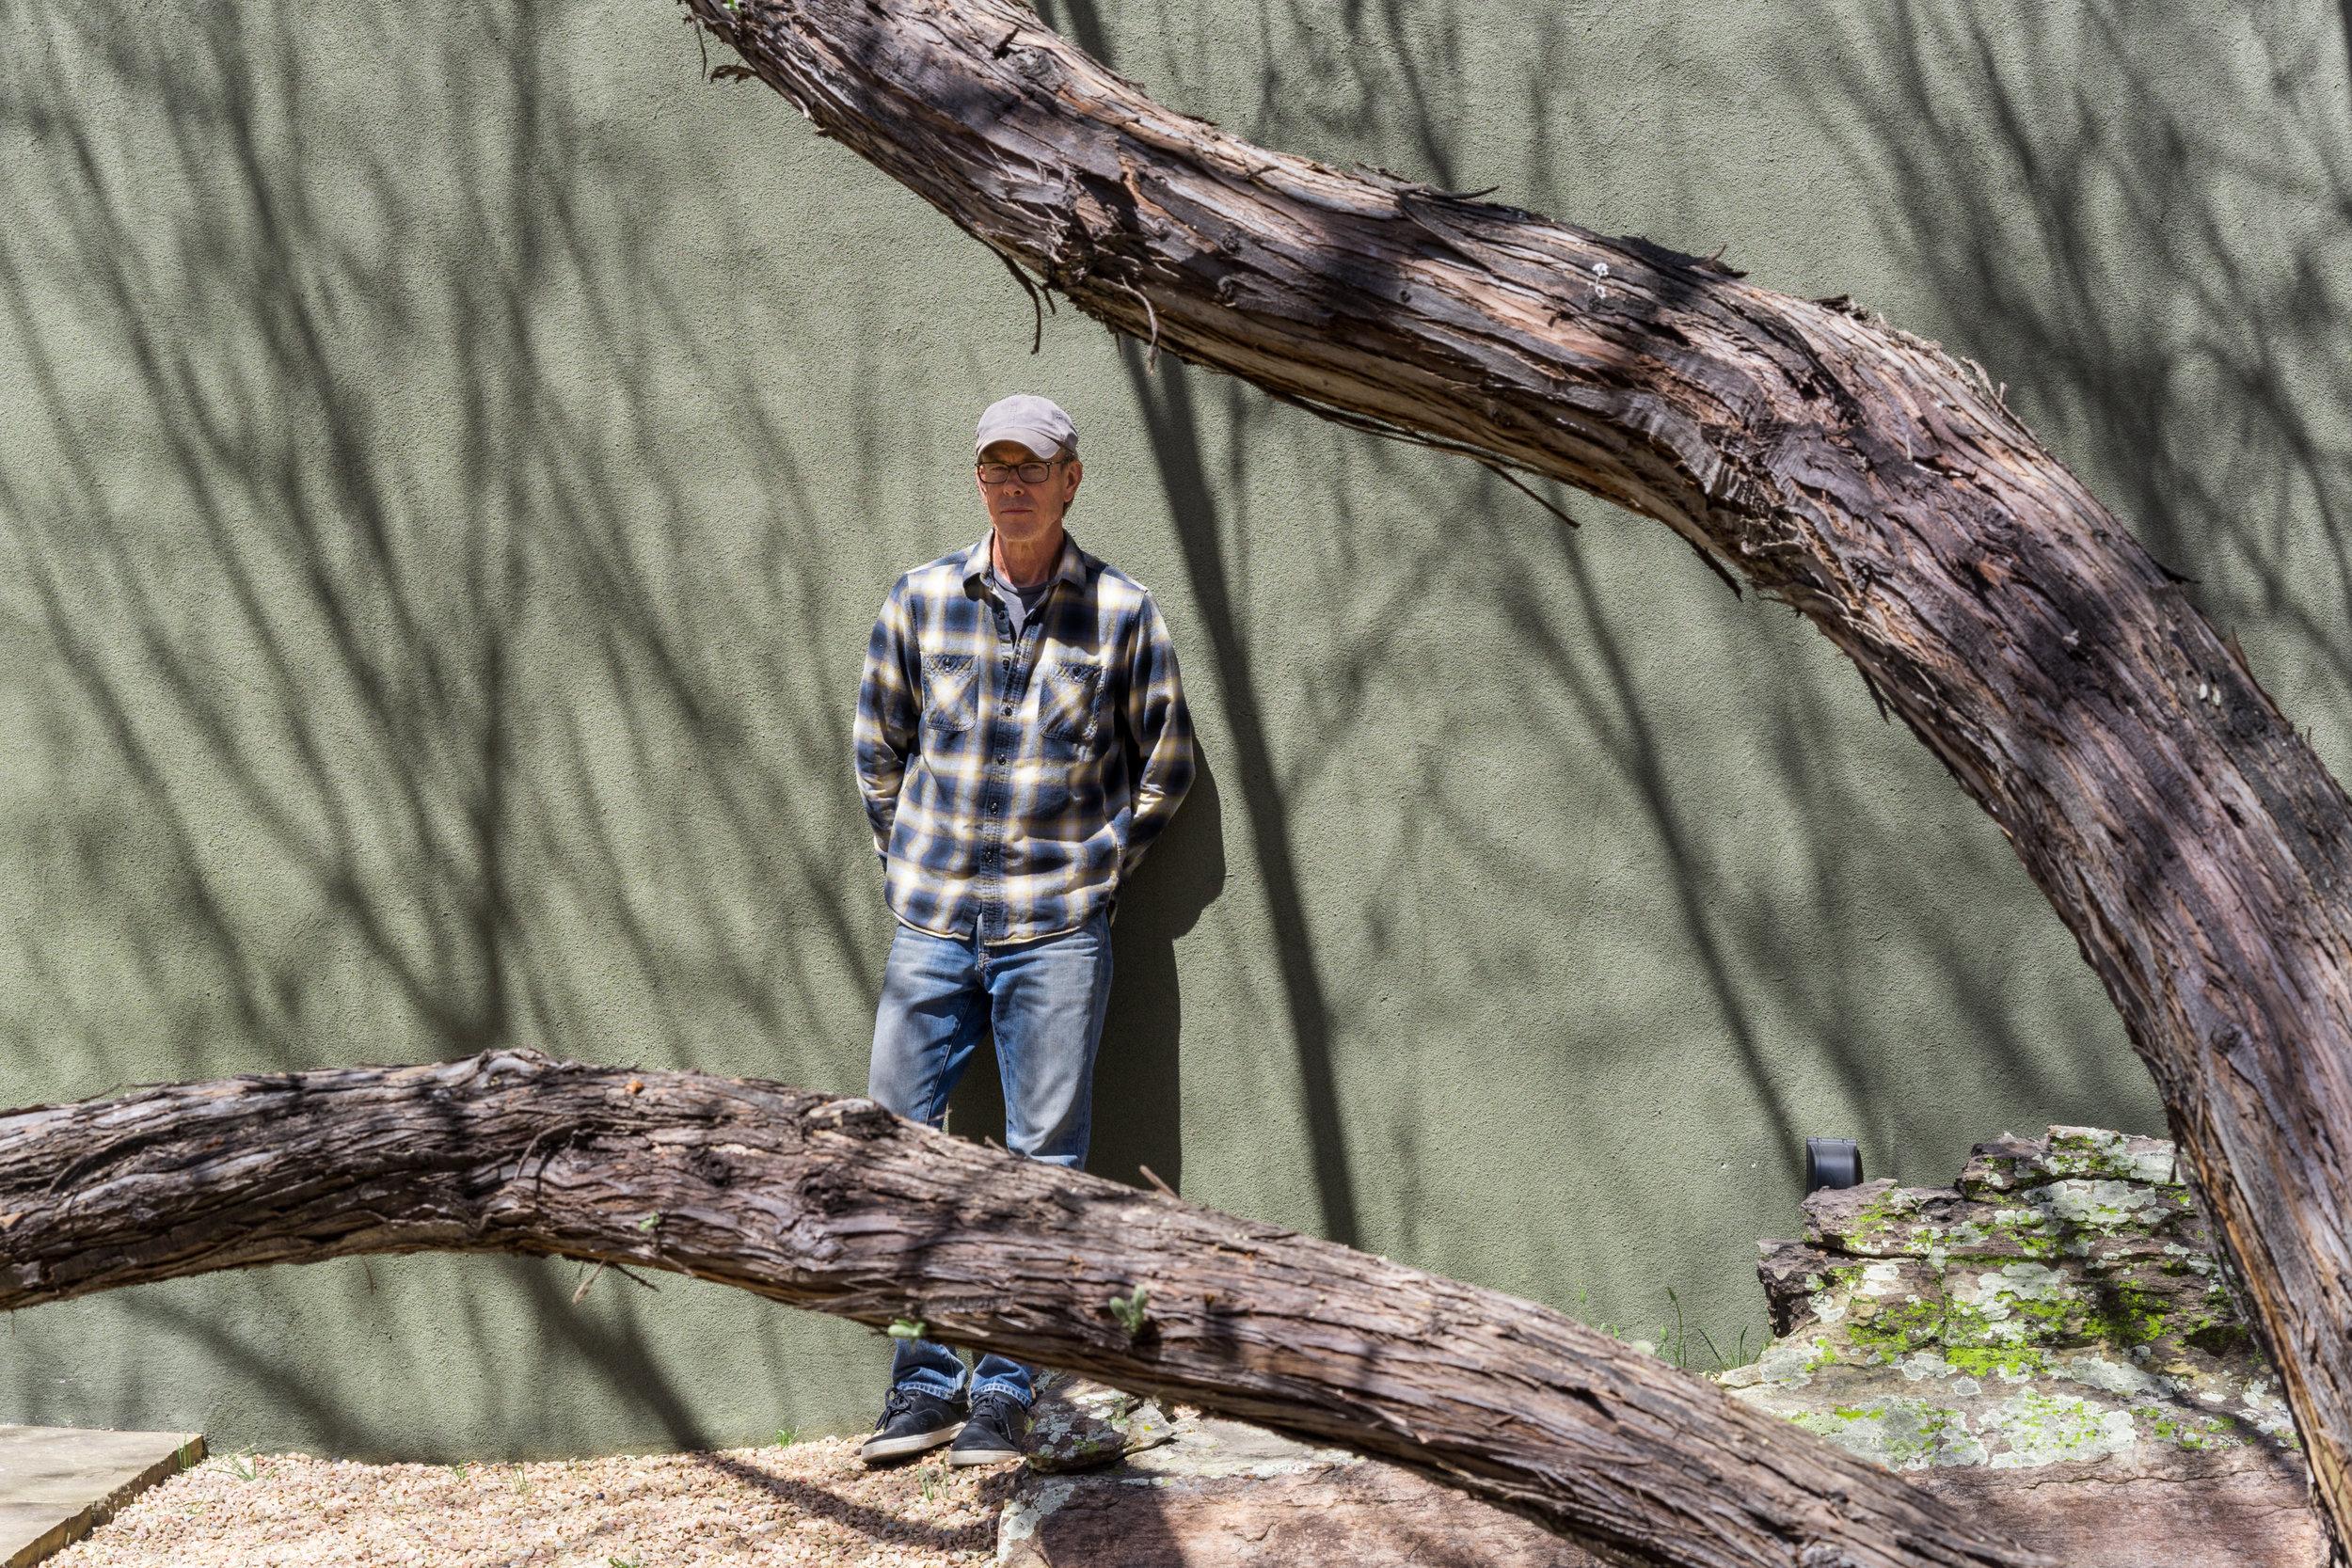 Jack Woody, Santa Fe, New Mexico, 2018 . Photo by Jordan Weitzman